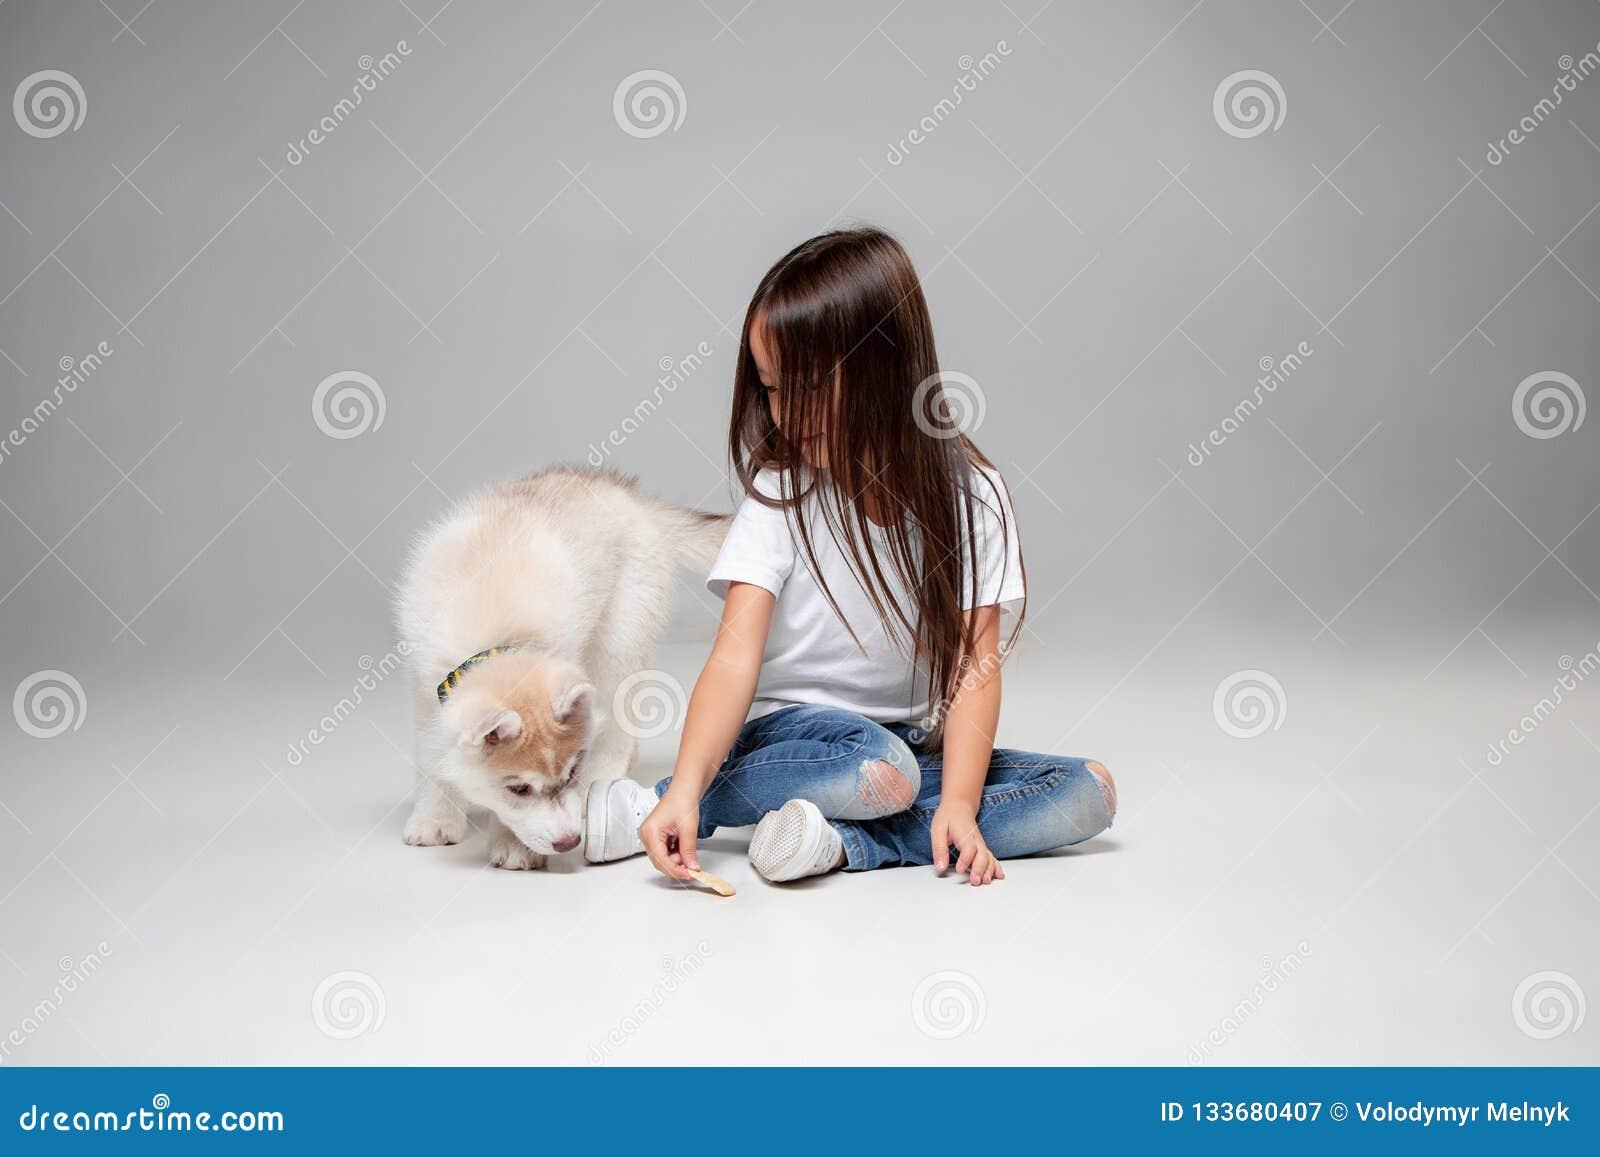 Portrait of a joyful little girl having fun with siberian husky puppy on the floor at studio